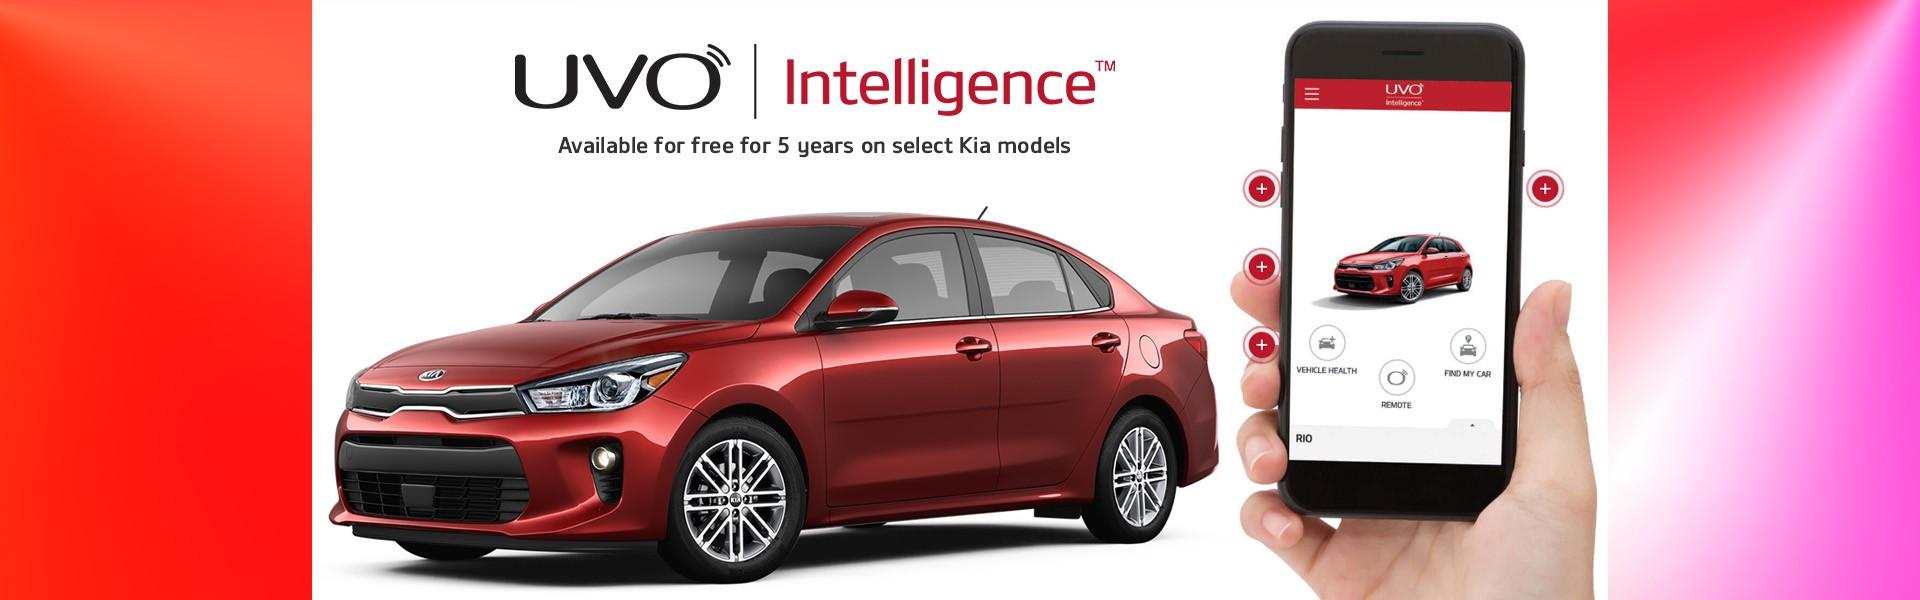 UVO Intelligence - Orillia Kia